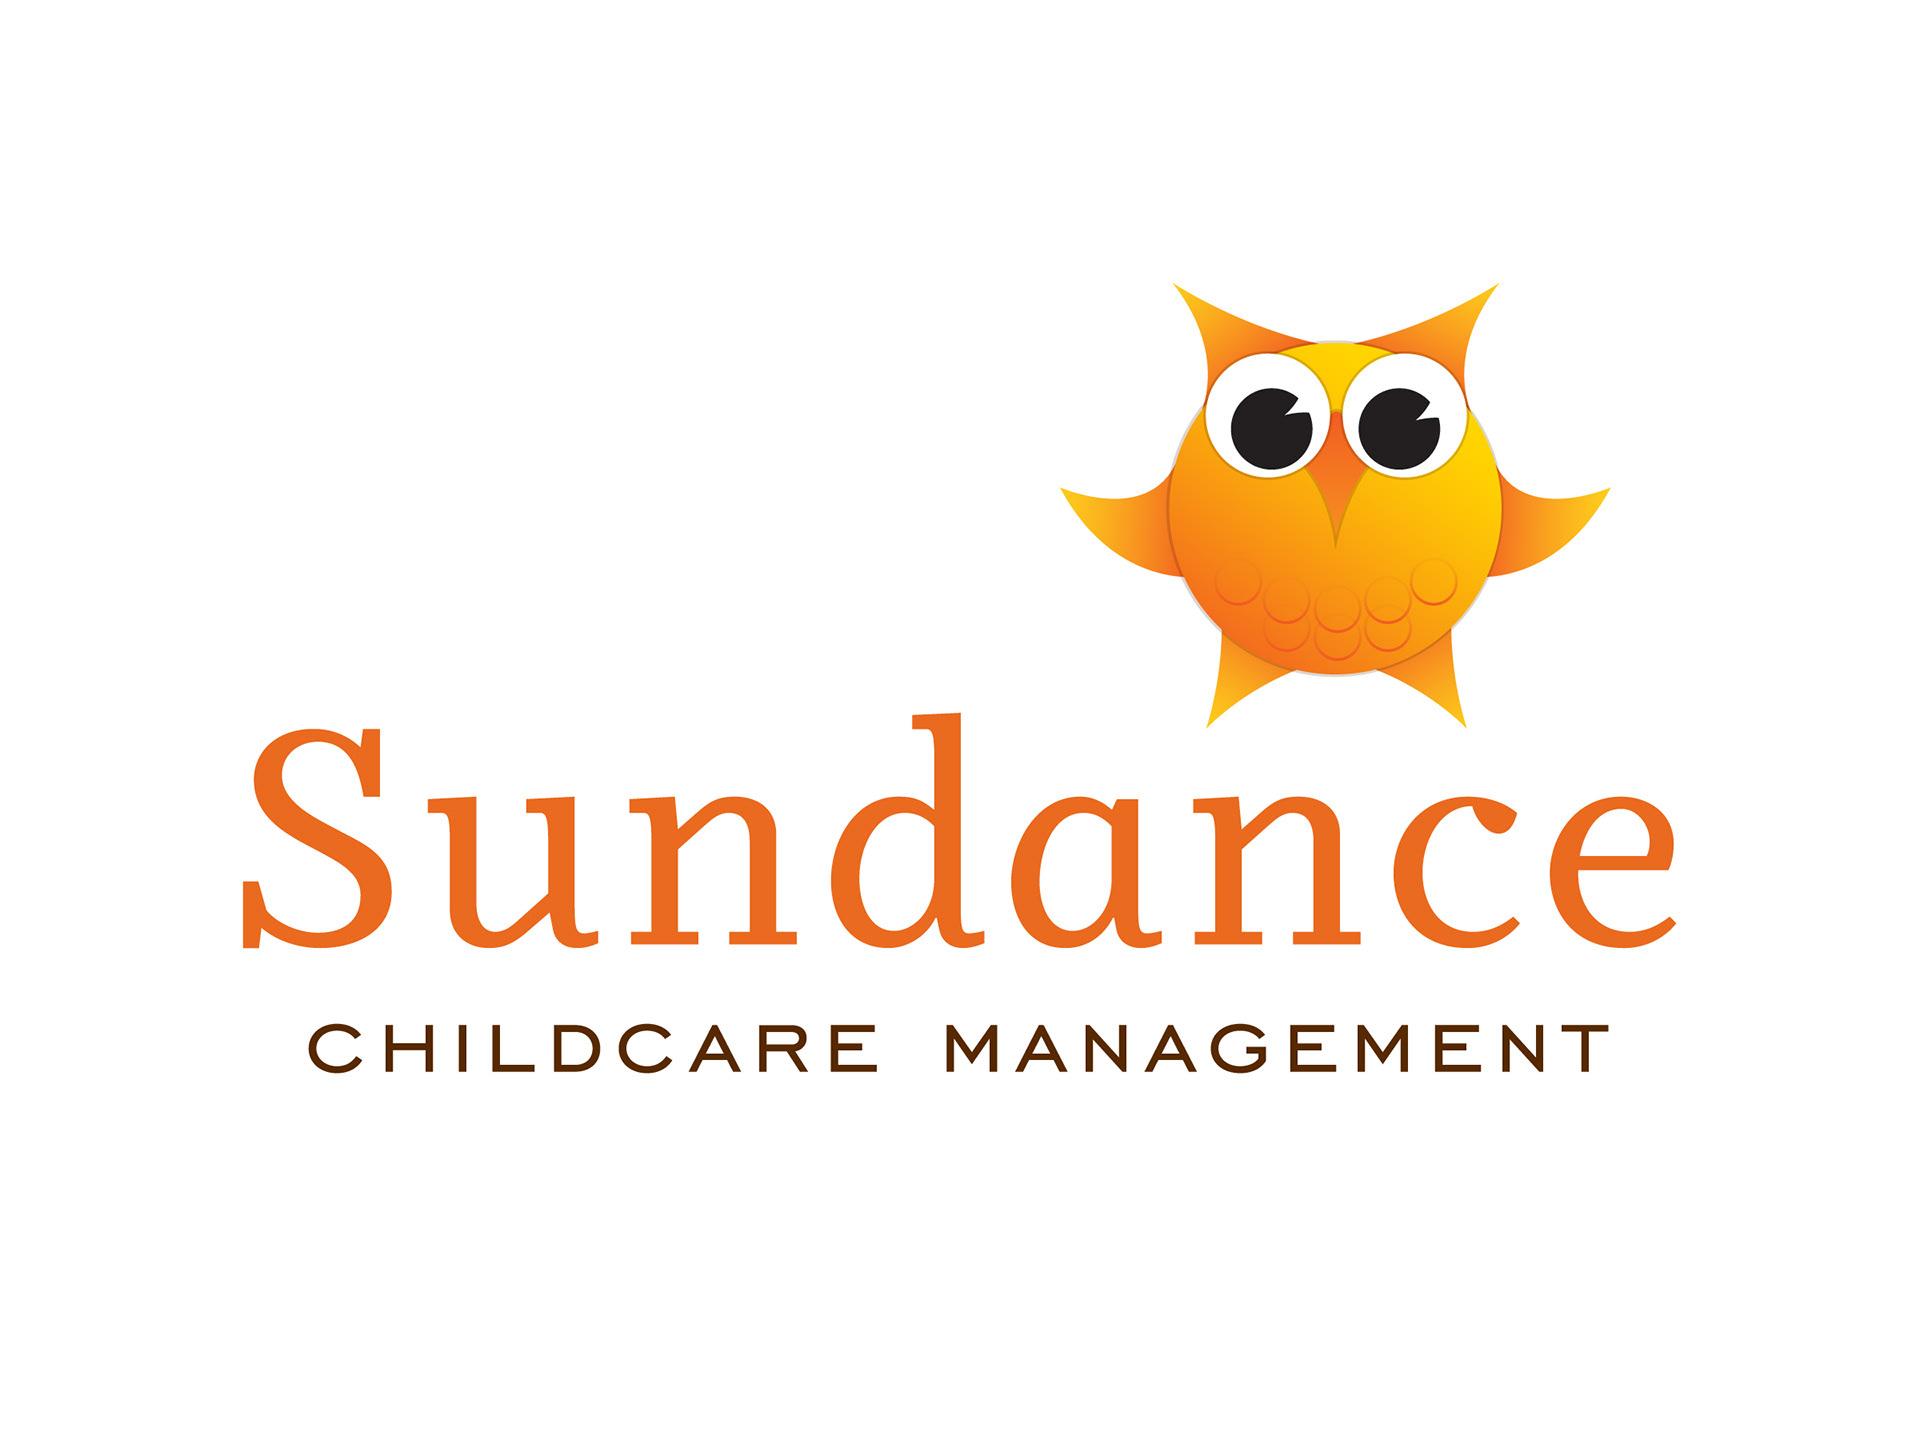 sundance childcare management logo designer